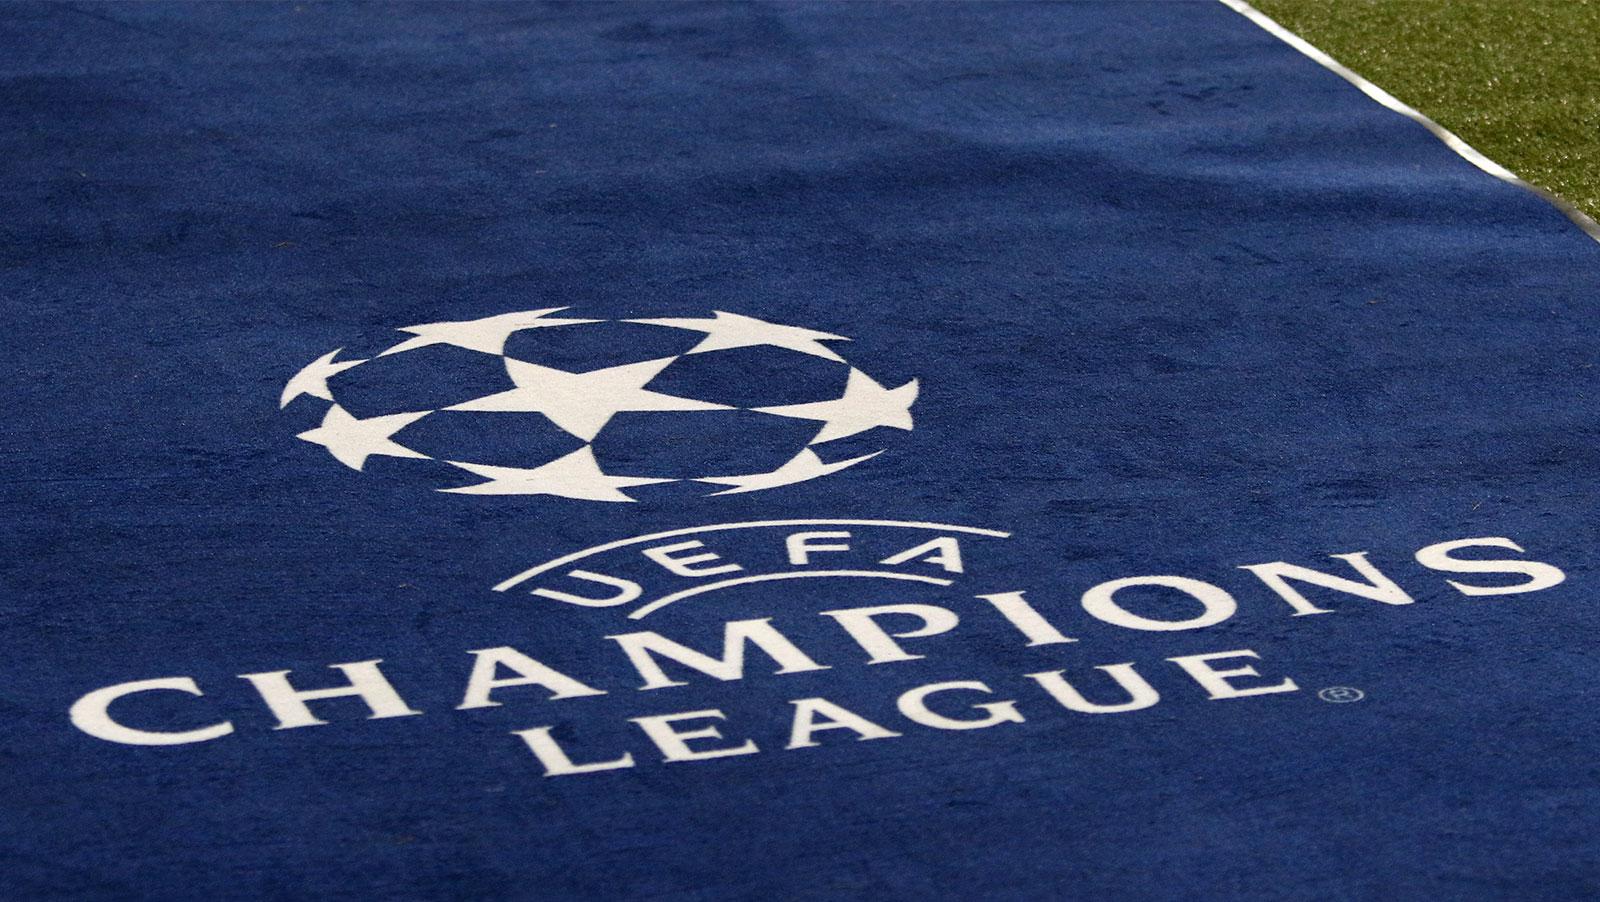 uefa-champions-league-draw-cantona-bonkers-van-dijk-and-alisson-win-awards